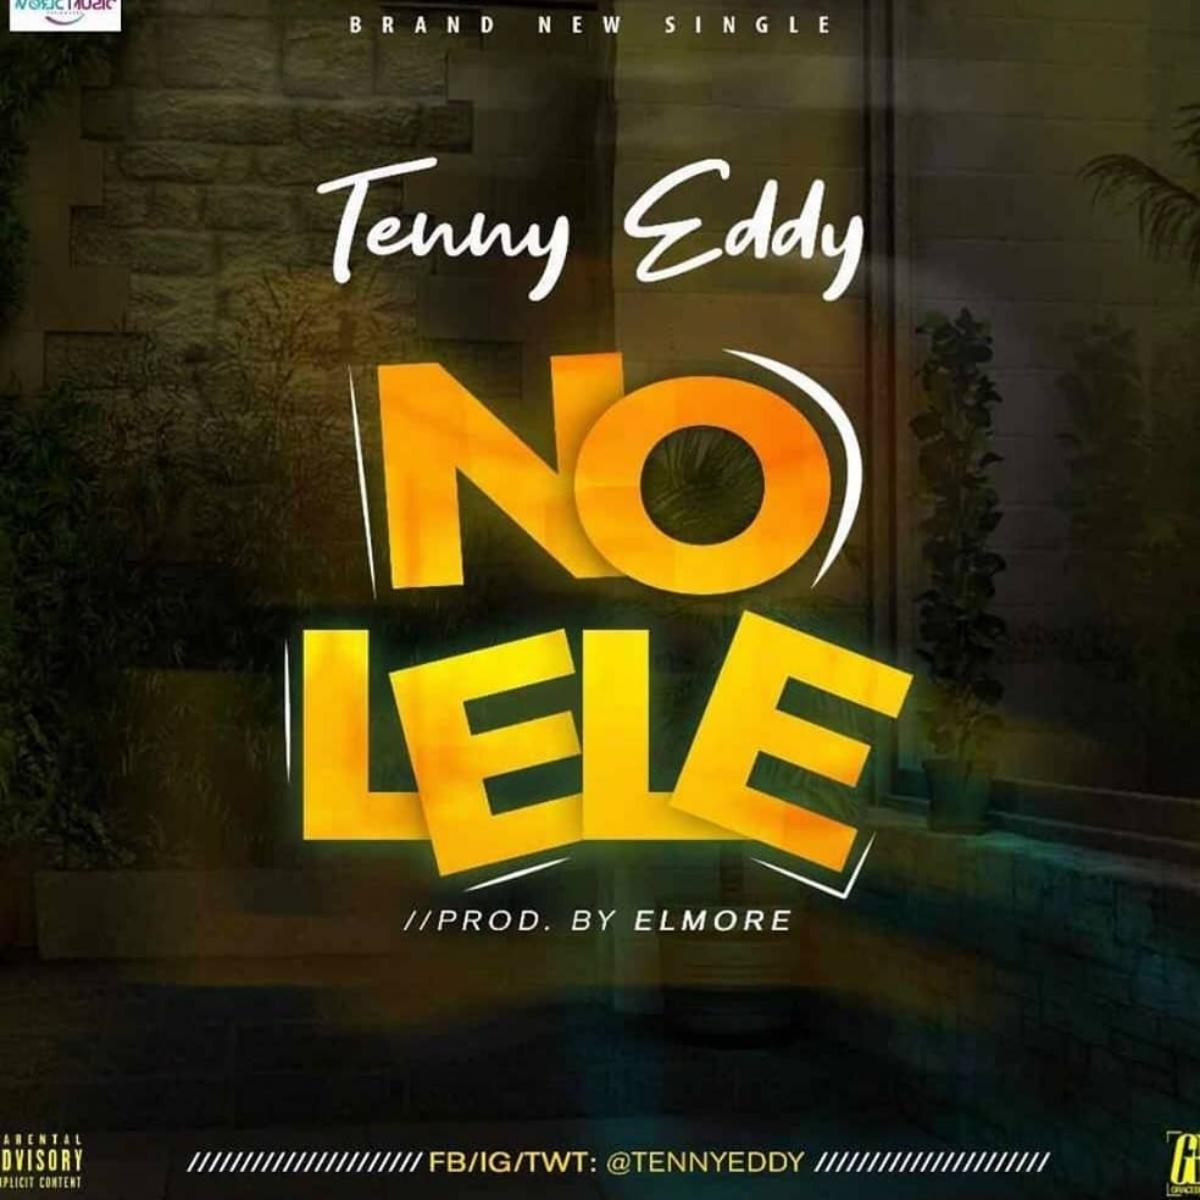 Tenny Eddy No Lele